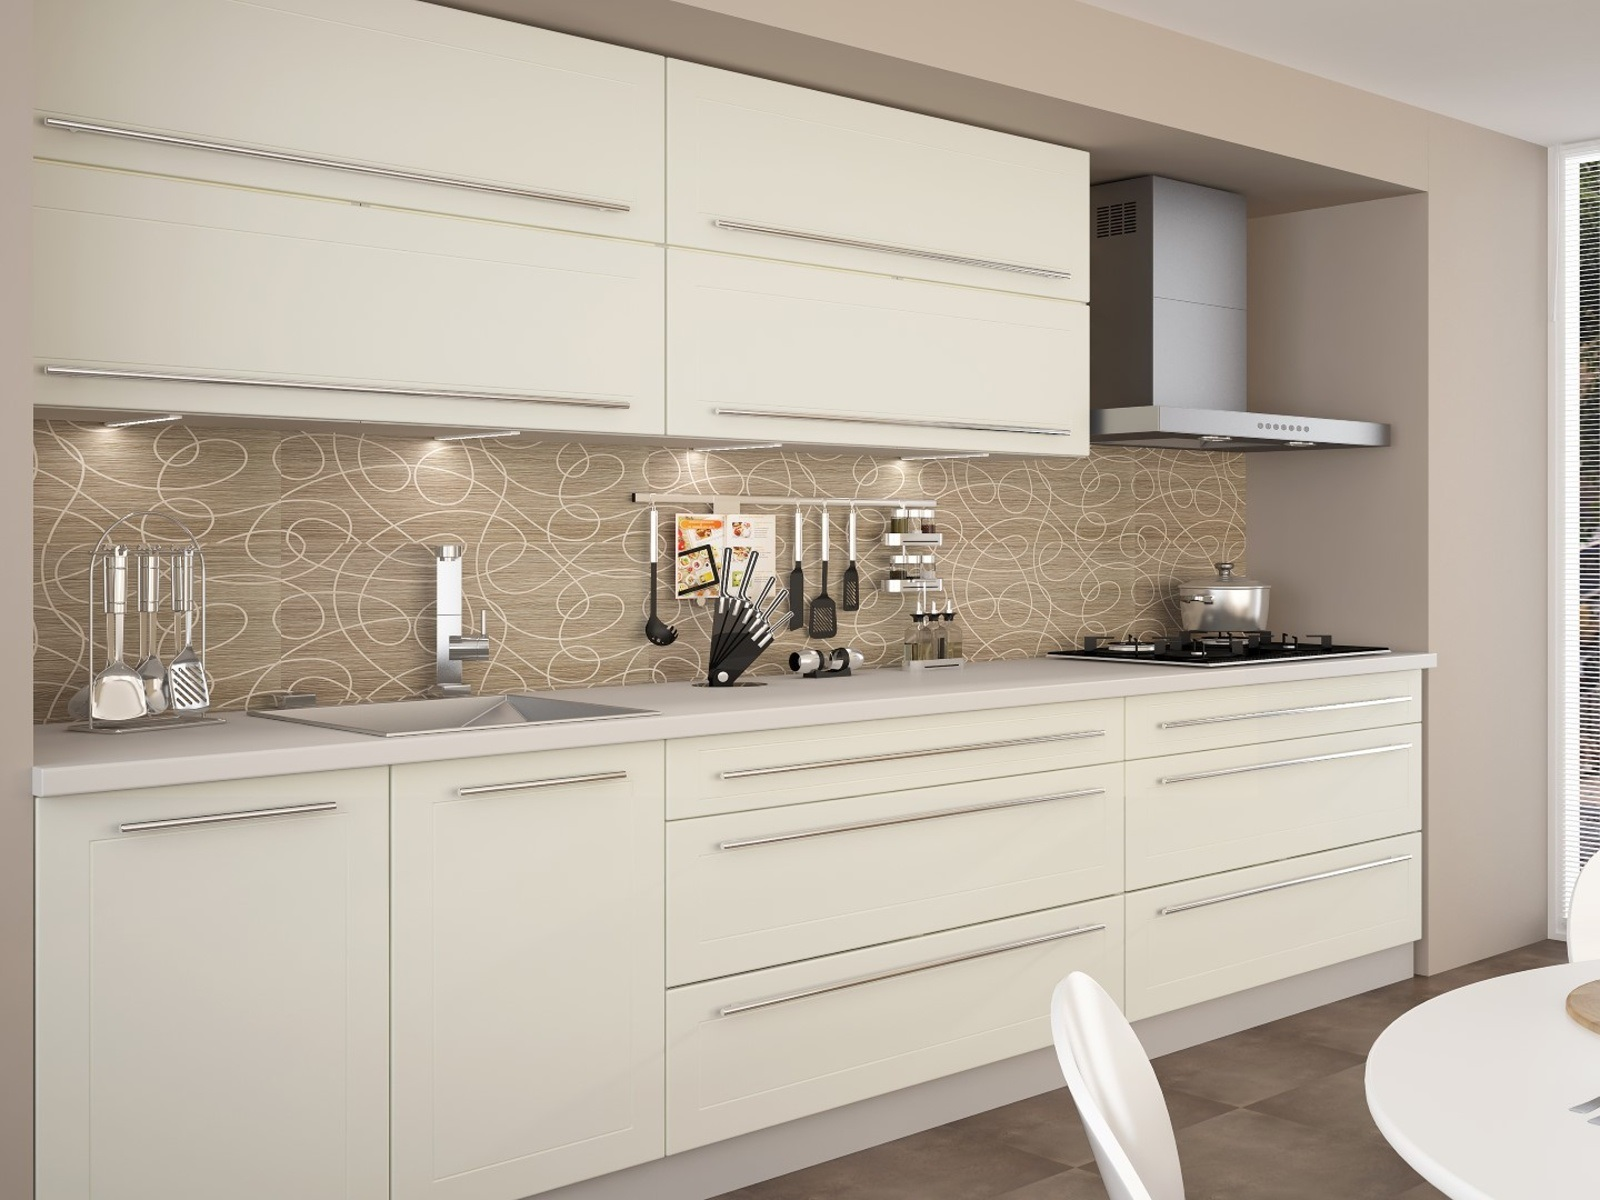 Extom Kuchyně QUANTUM, vzorová sestava, vanilla mat/grey